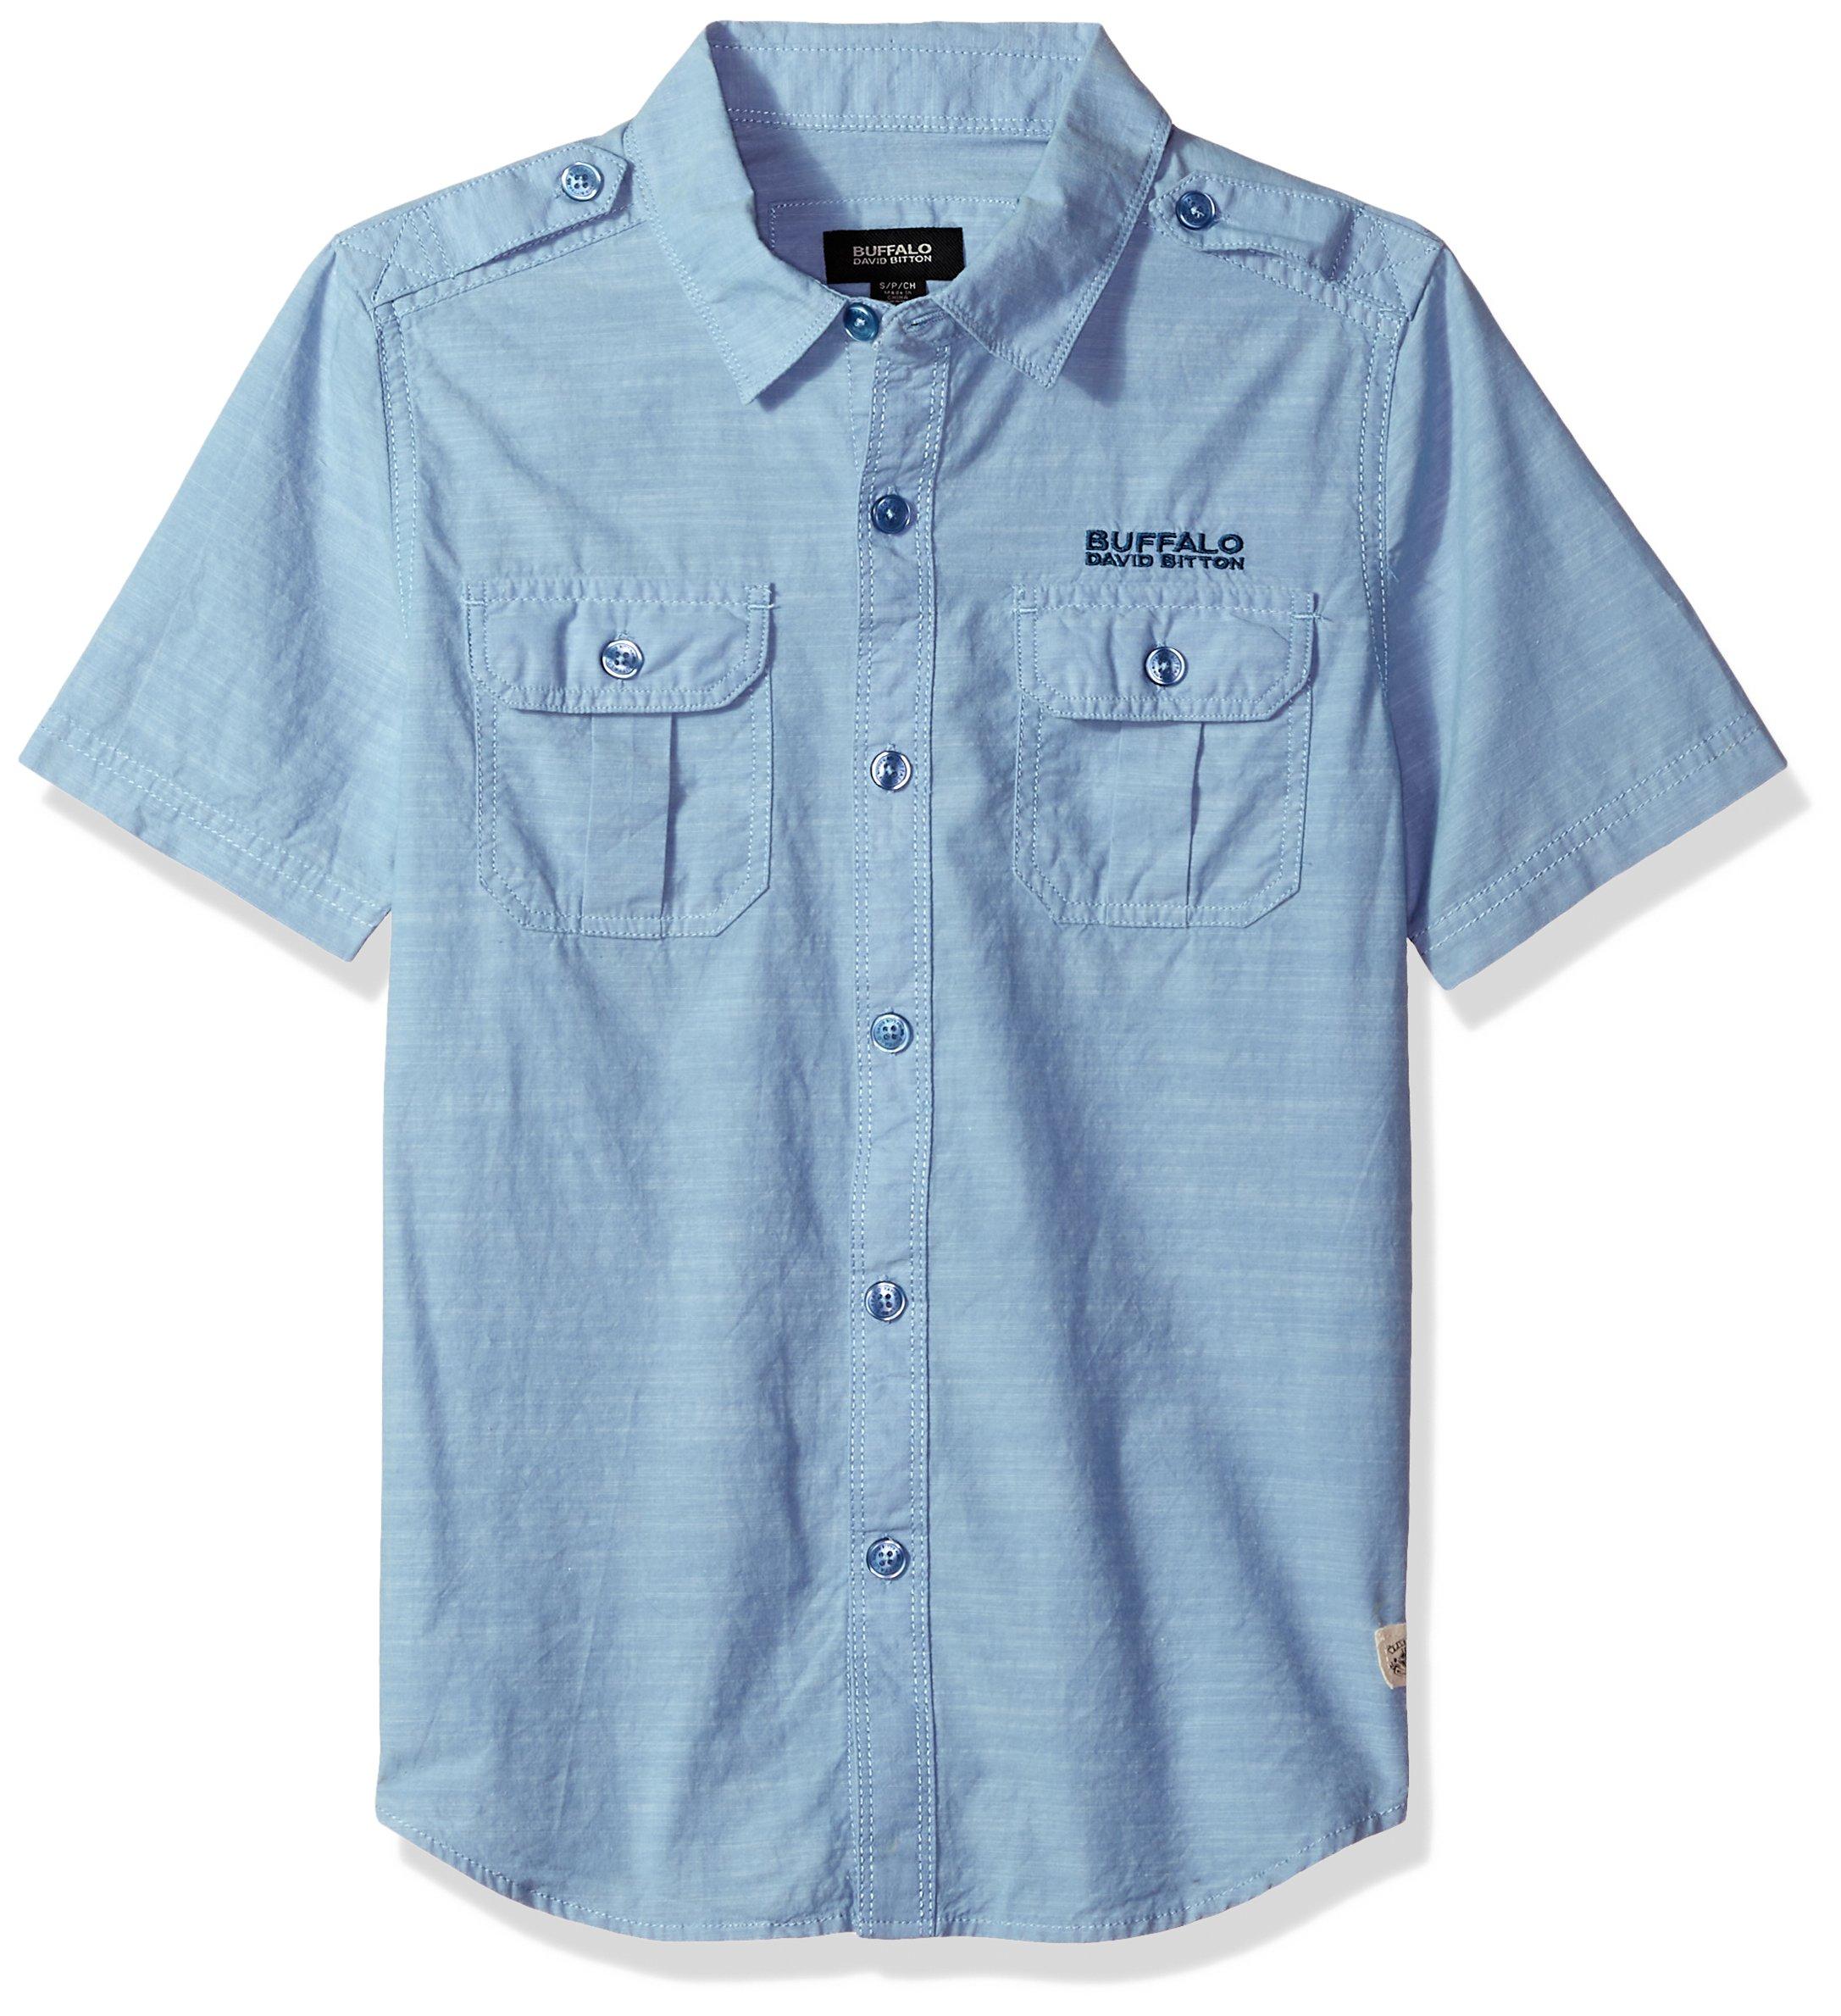 Buffalo by David Bitton Boys' Big Short Sleeve Button Down Shirt, Selid Federal Blue Heather, Small (8)